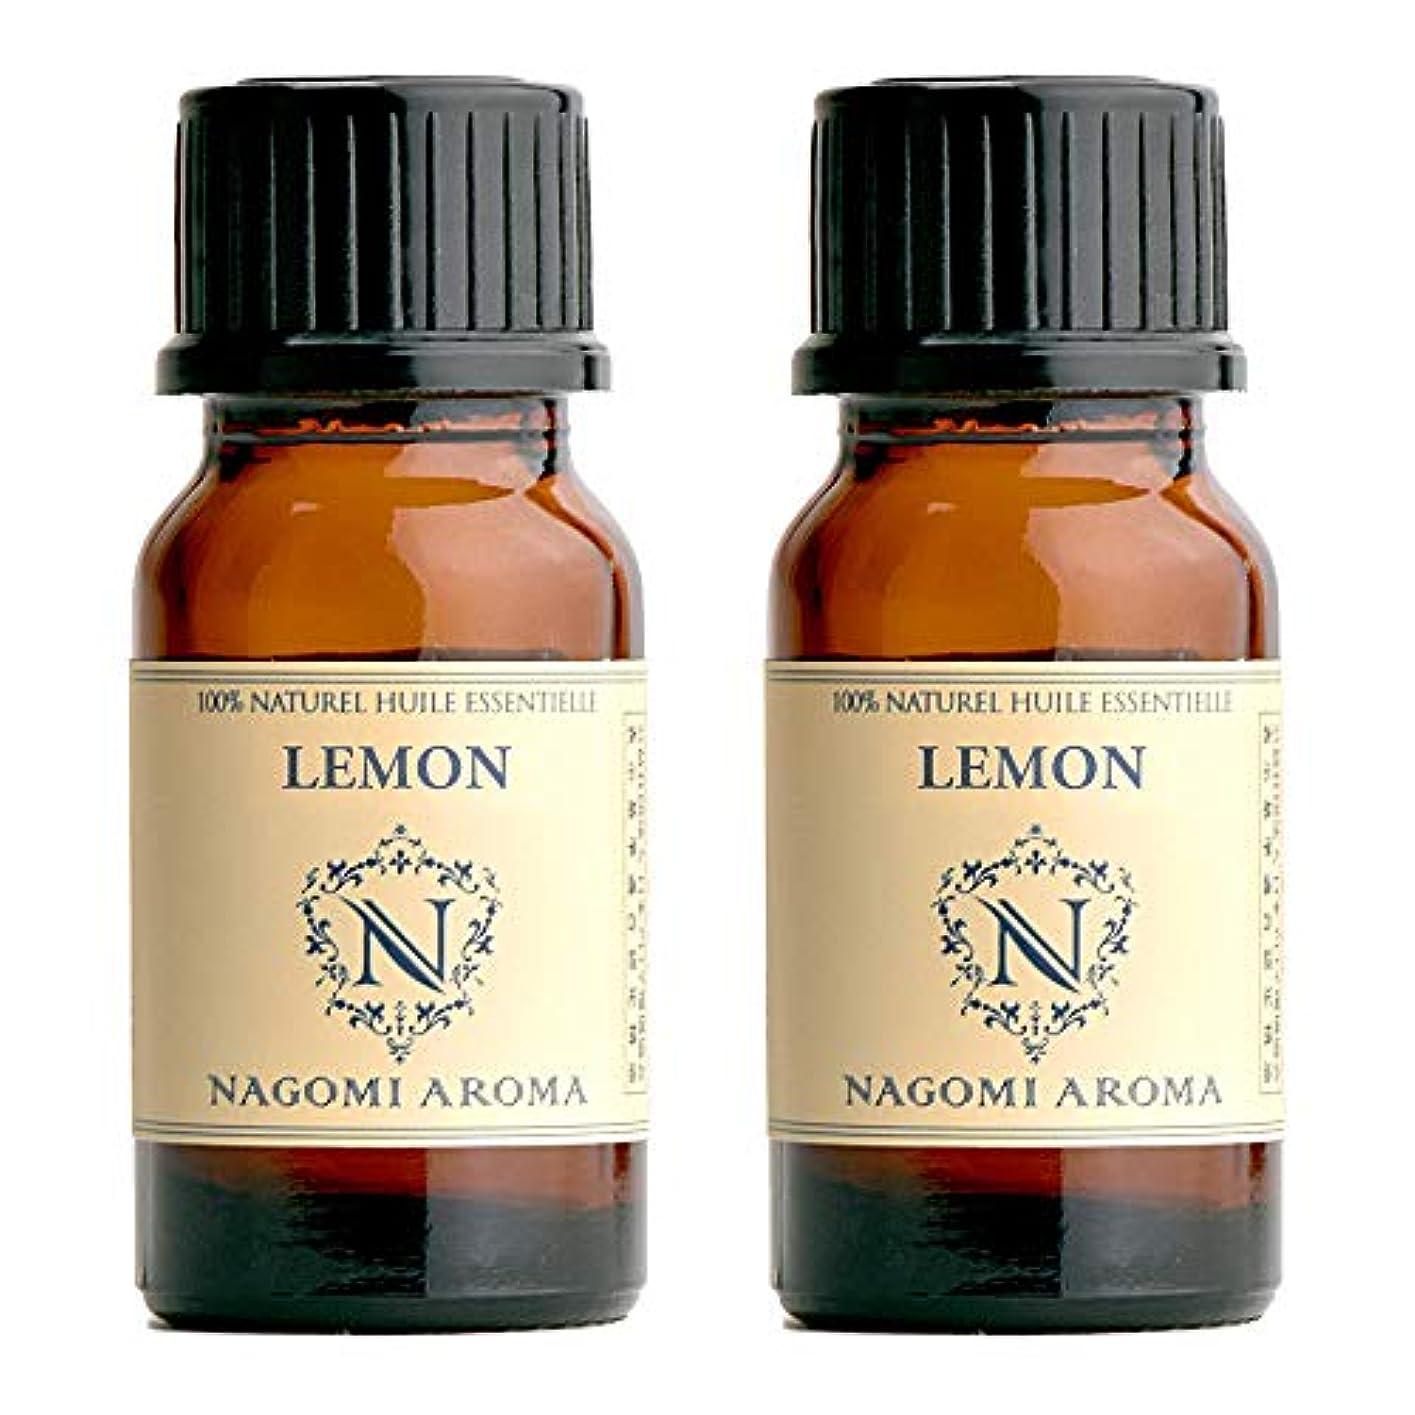 NAGOMI AROMA レモン 10ml 【AEAJ認定精油】【アロマオイル】 2個セット